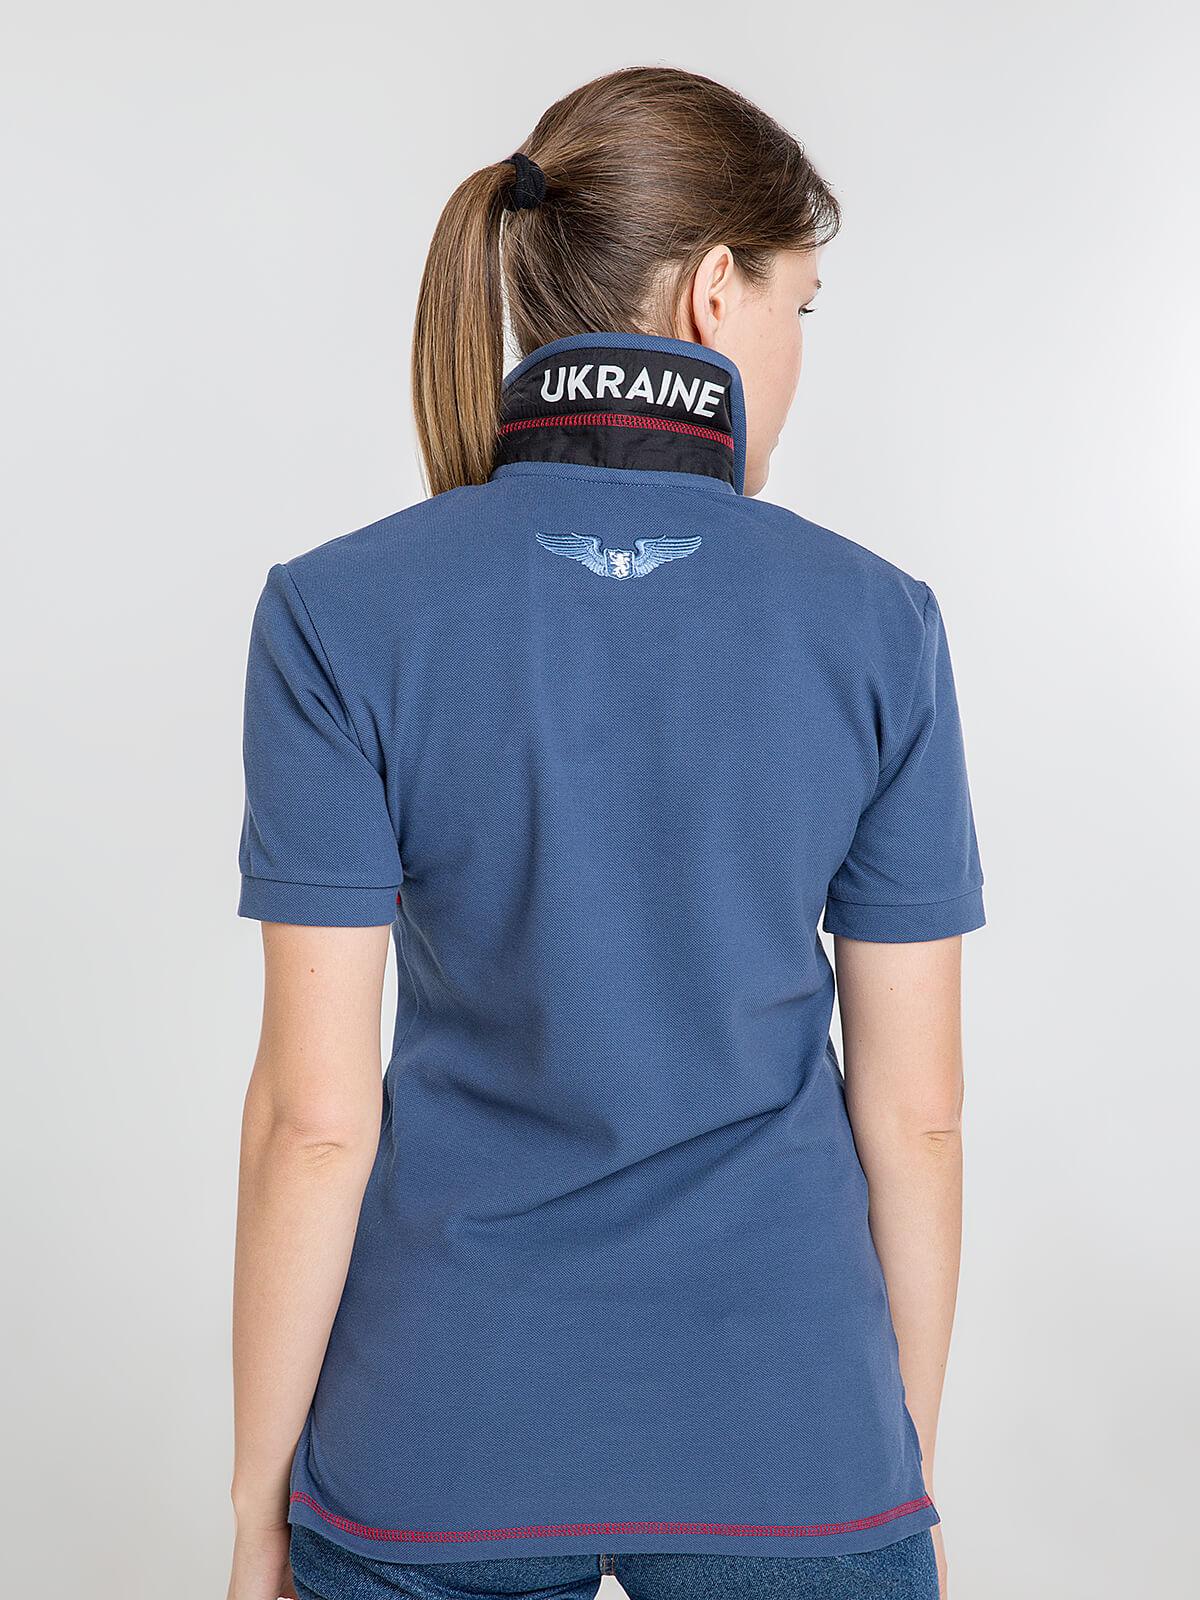 Women's Polo Shirt Wings. Color denim.  Pique fabric: 100% cotton.